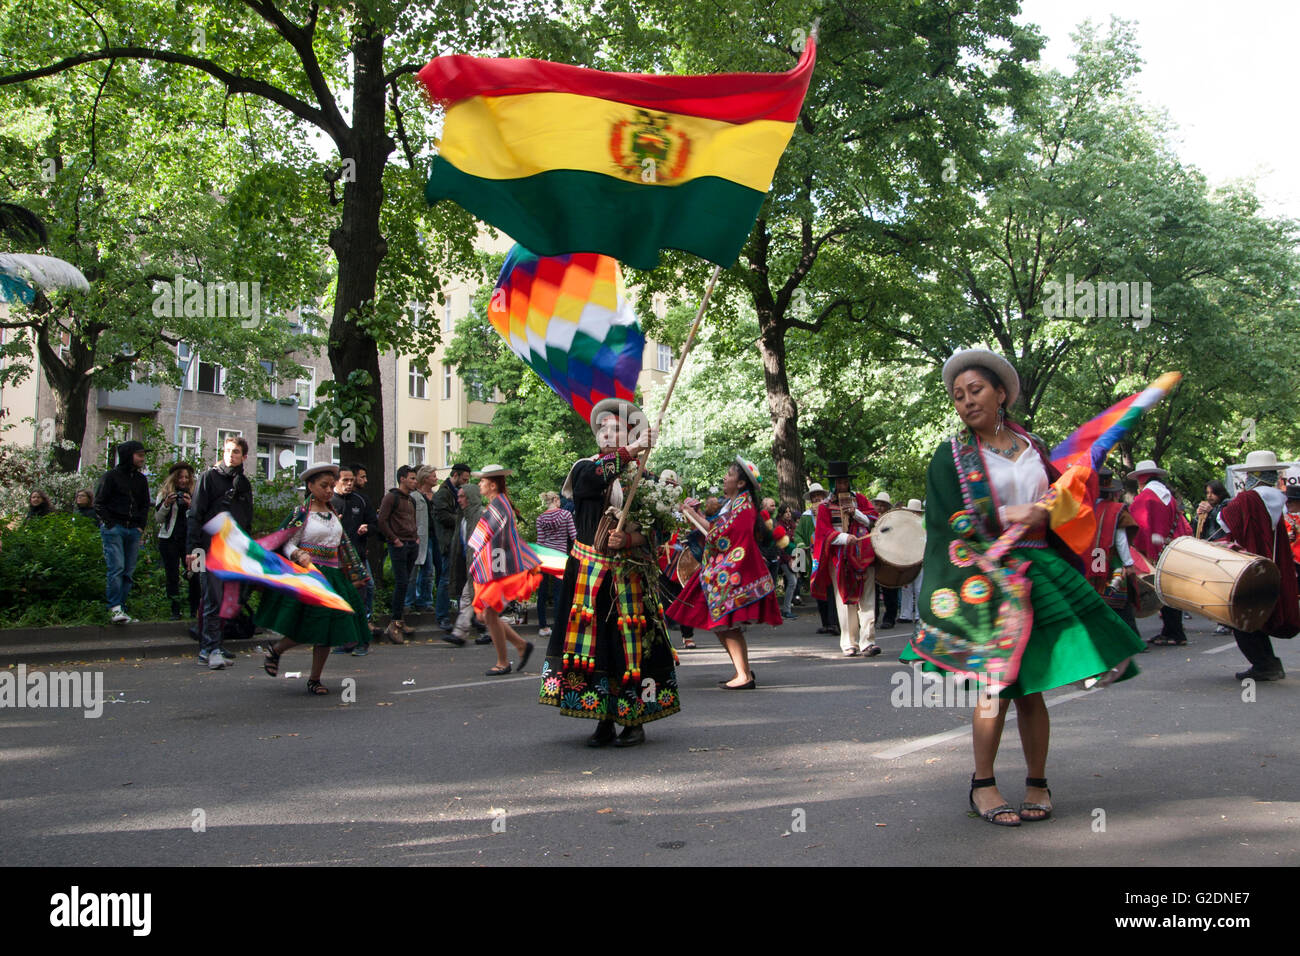 Carnaval des Cultures. Berlin, Allemagne. Photo Stock